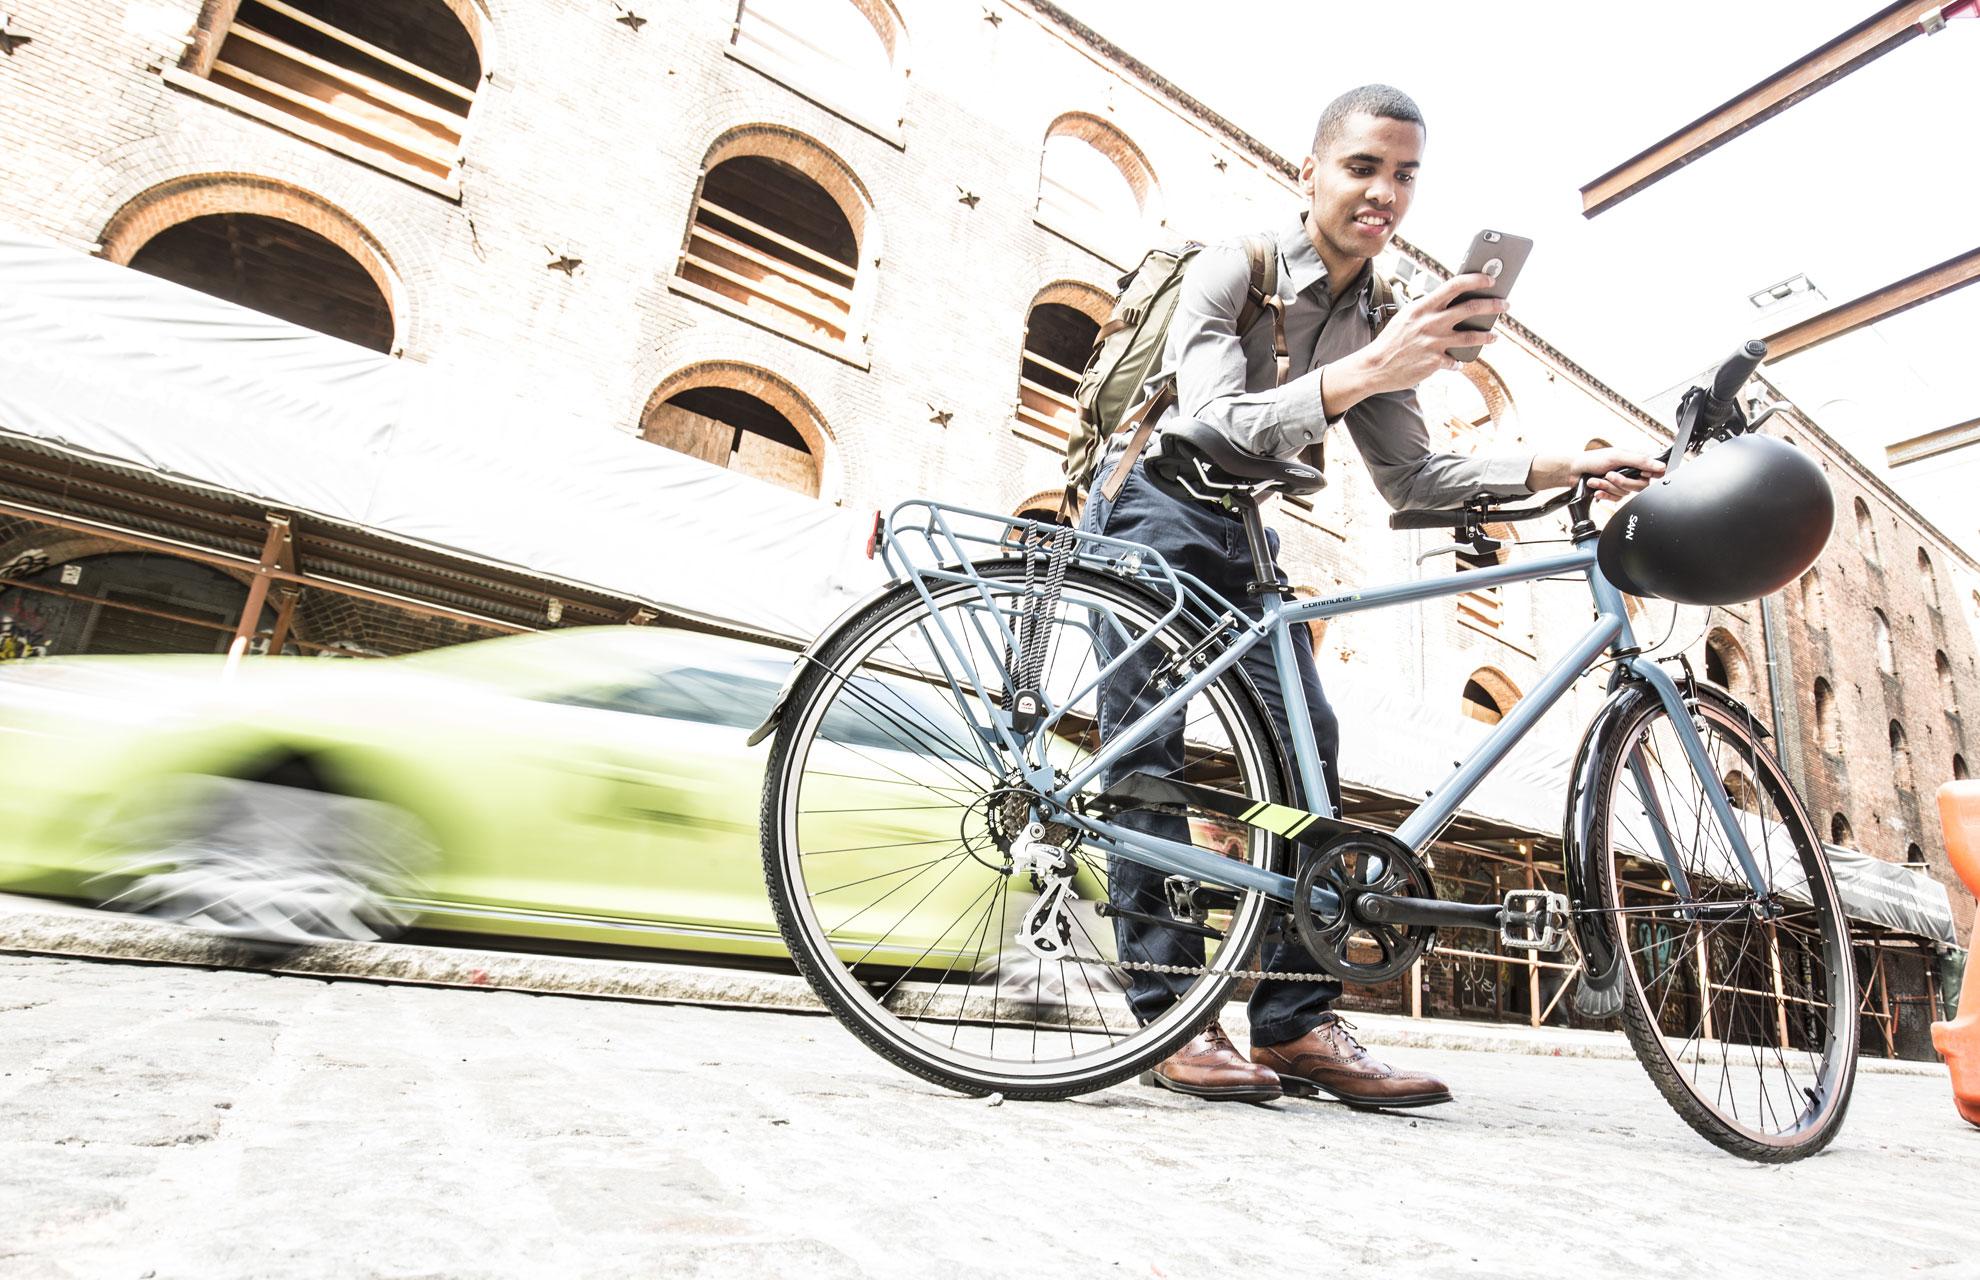 urban bike アーバンバイク jamis bicycles ジェイミスジャパン